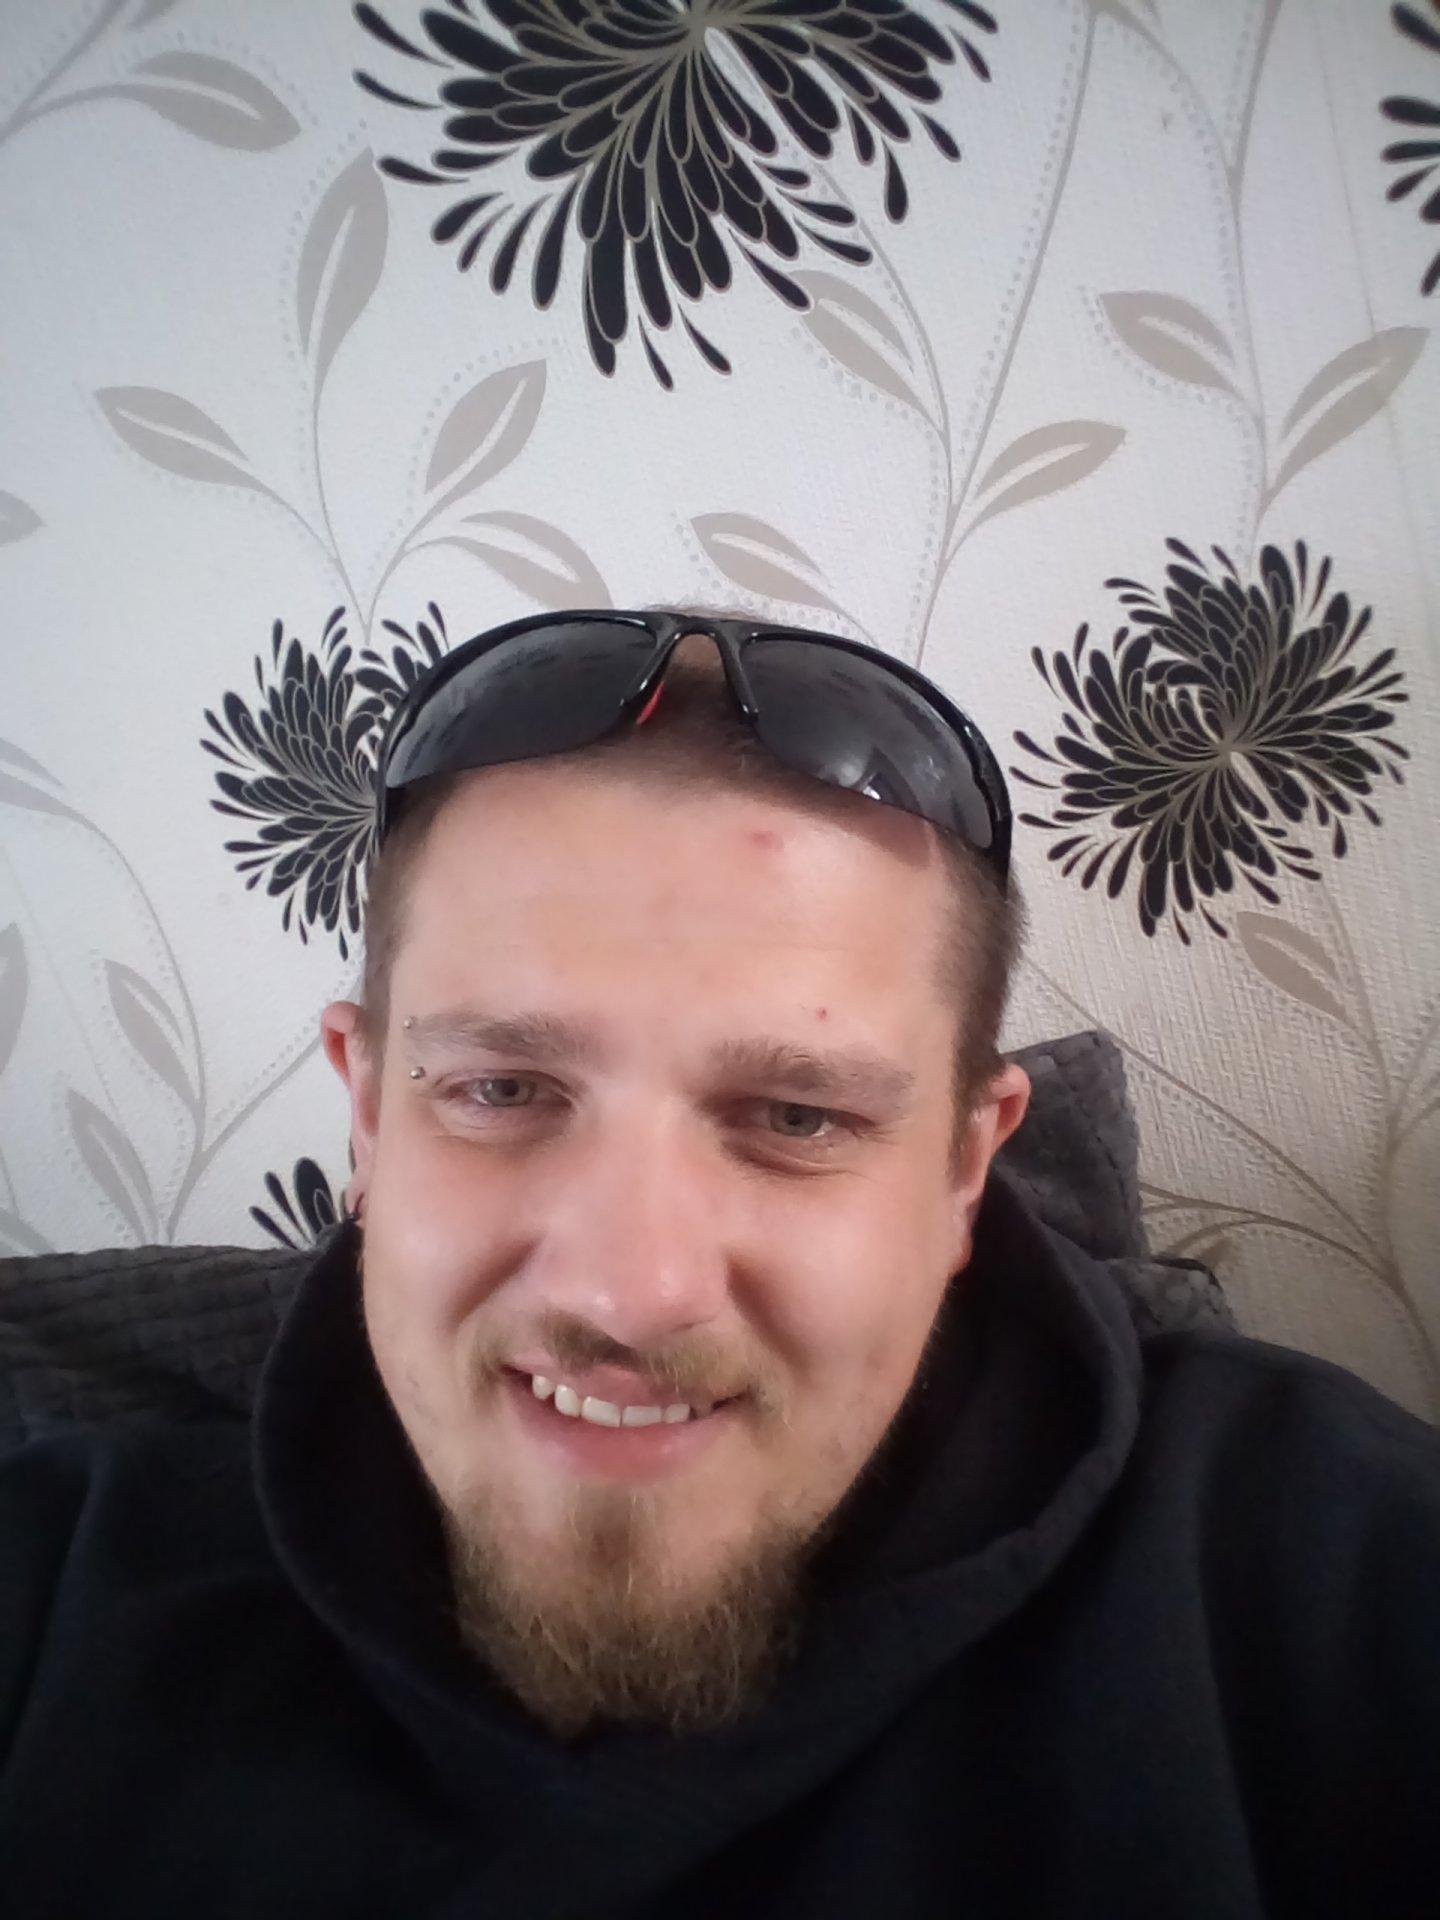 Bigcockjosh from City of Wolverhampton,United Kingdom